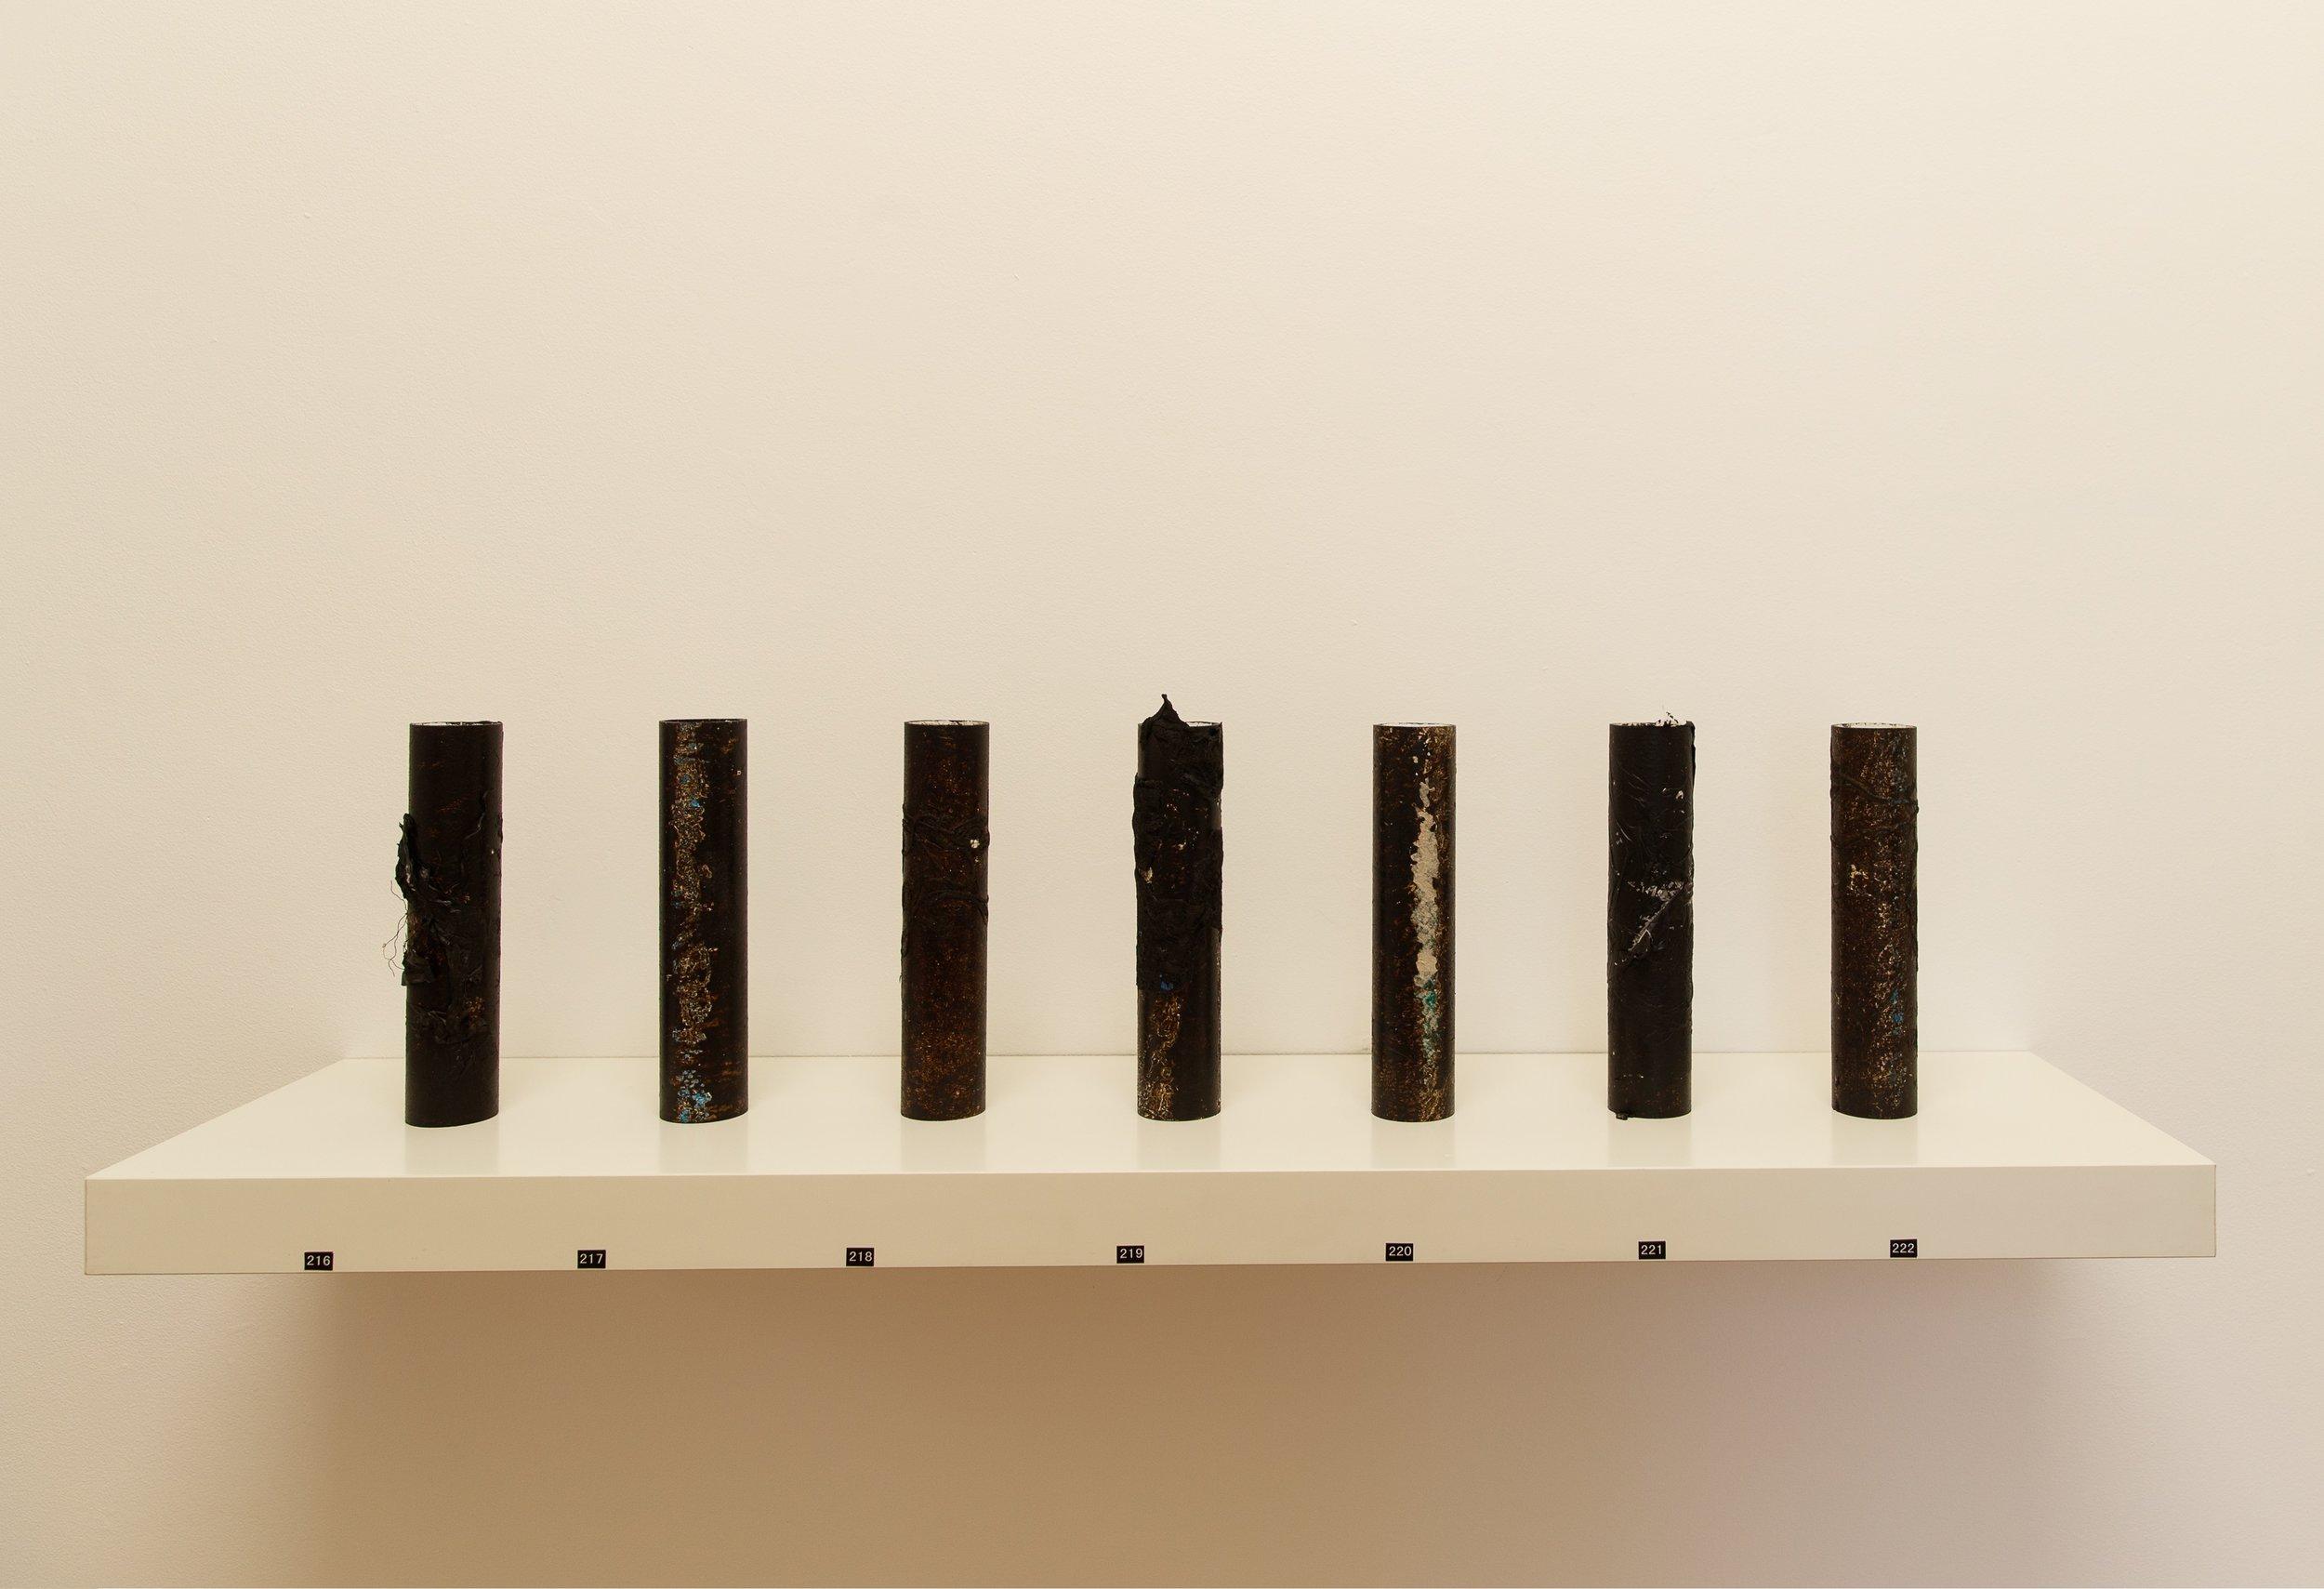 Remains # 1 - 7   bitumen rubber, detritus on PVC pipe  22.5 x 4.8 x 4.8 cm each  Photograph James Field, courtesy Adelaide Central School of Art